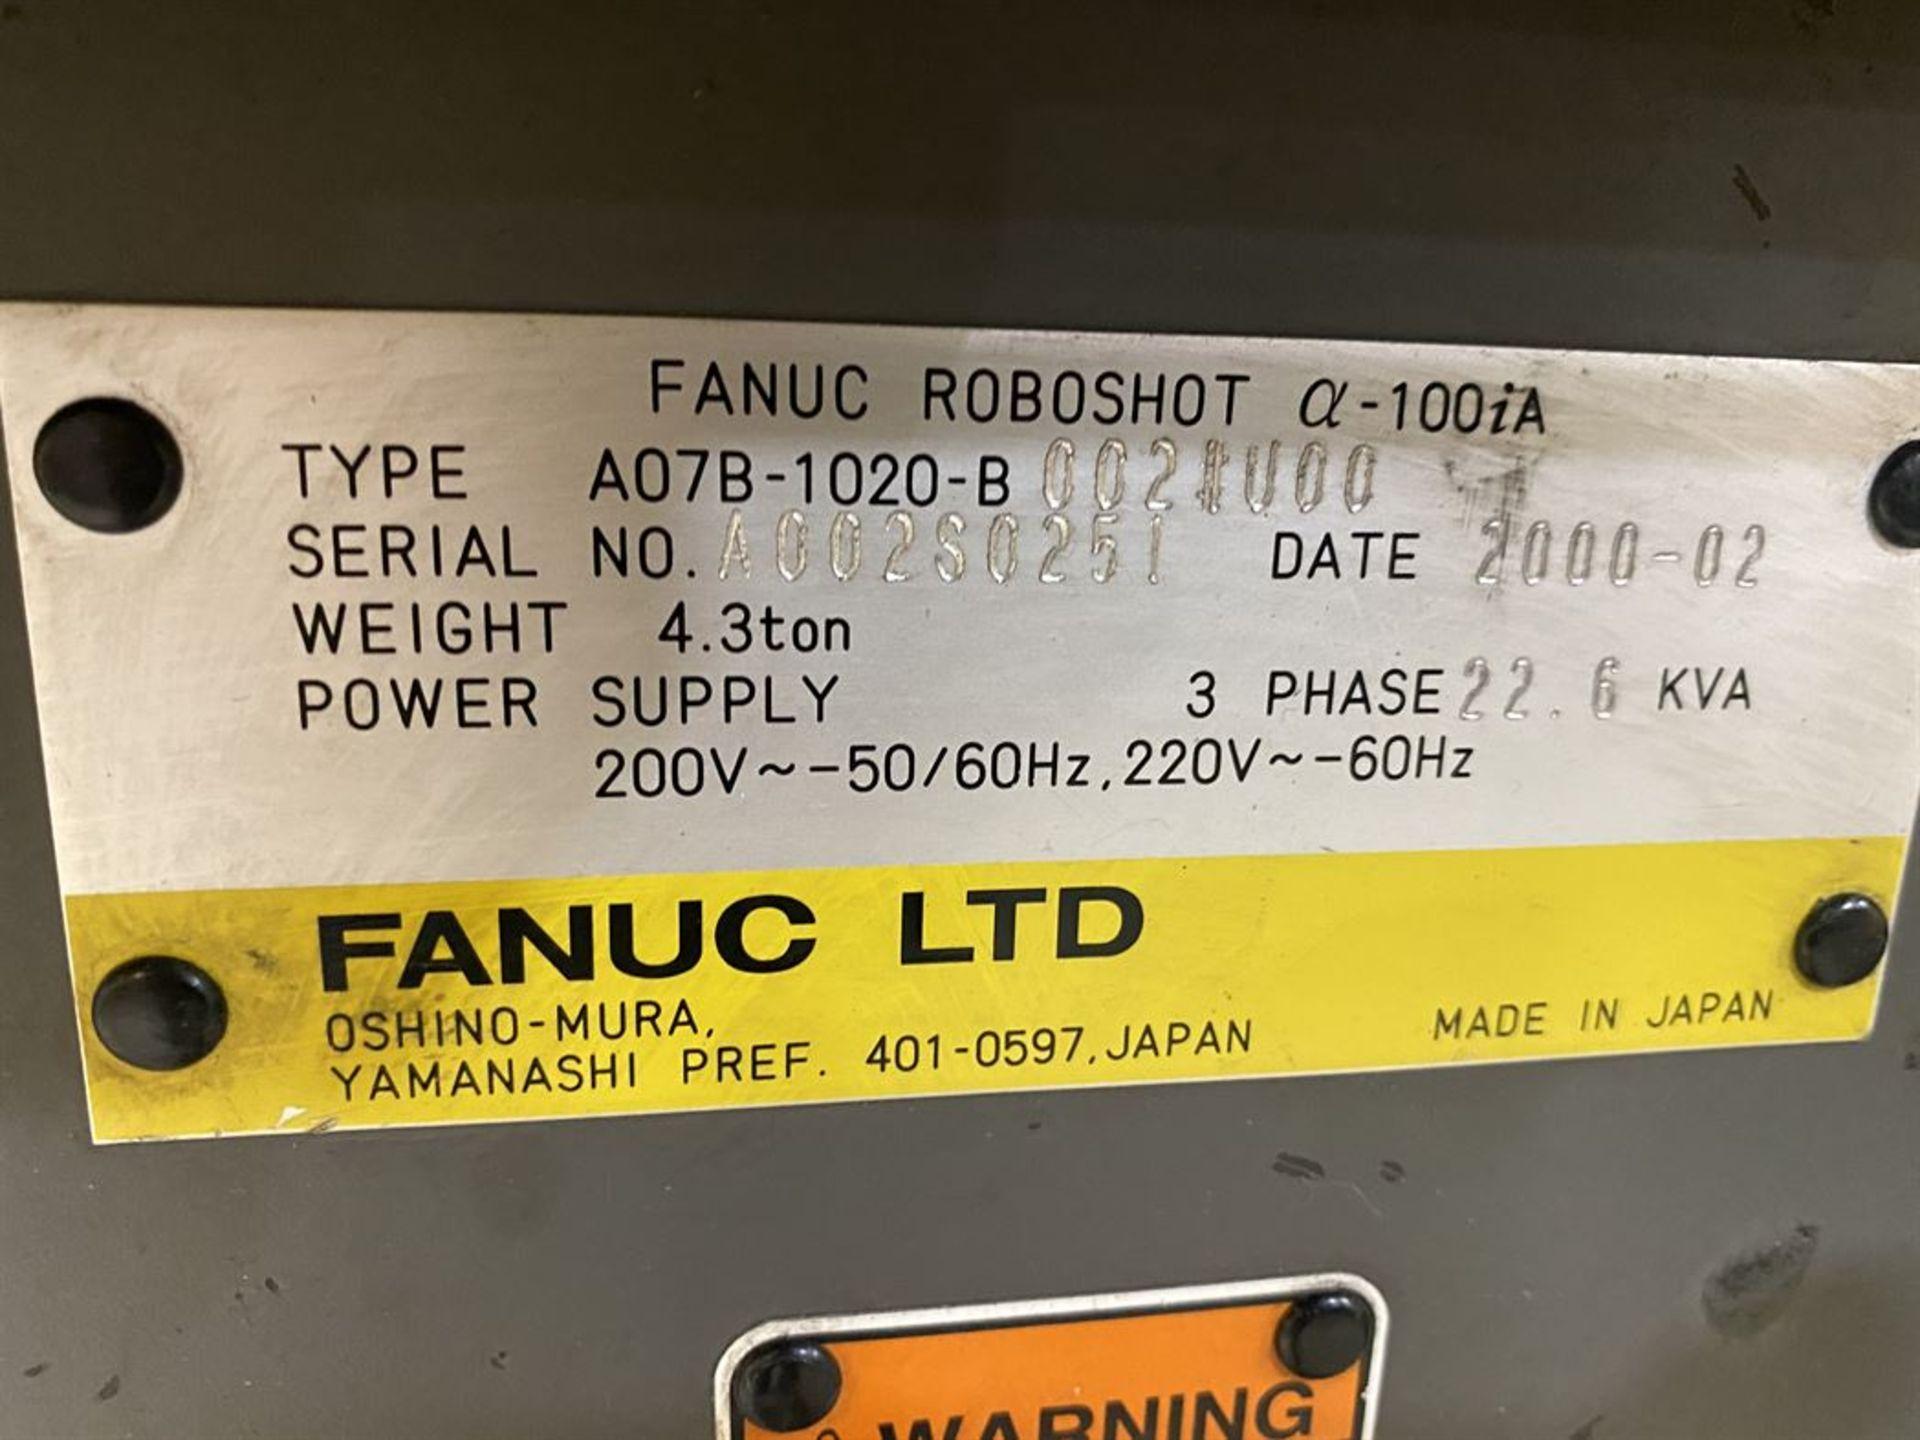 Lot 192 - 2000 CINCINNATI MILACRON FANUC RoboShot 110i-97 110 Ton Electric Injection Molder, s/n 4164A02/99-